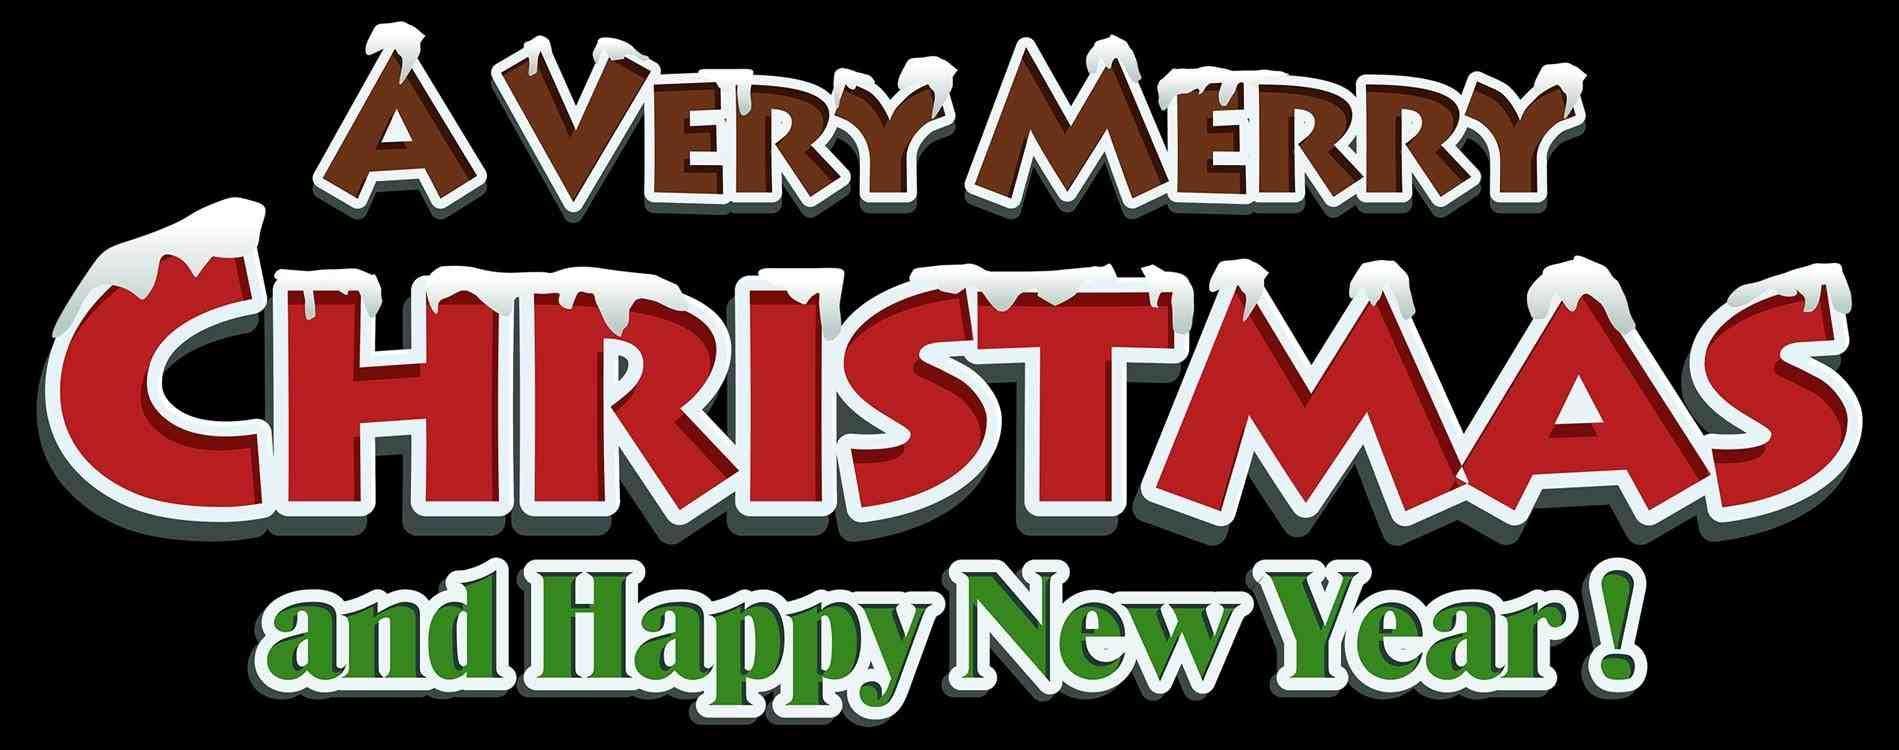 merry christmas rustic clip art Merry christmas text